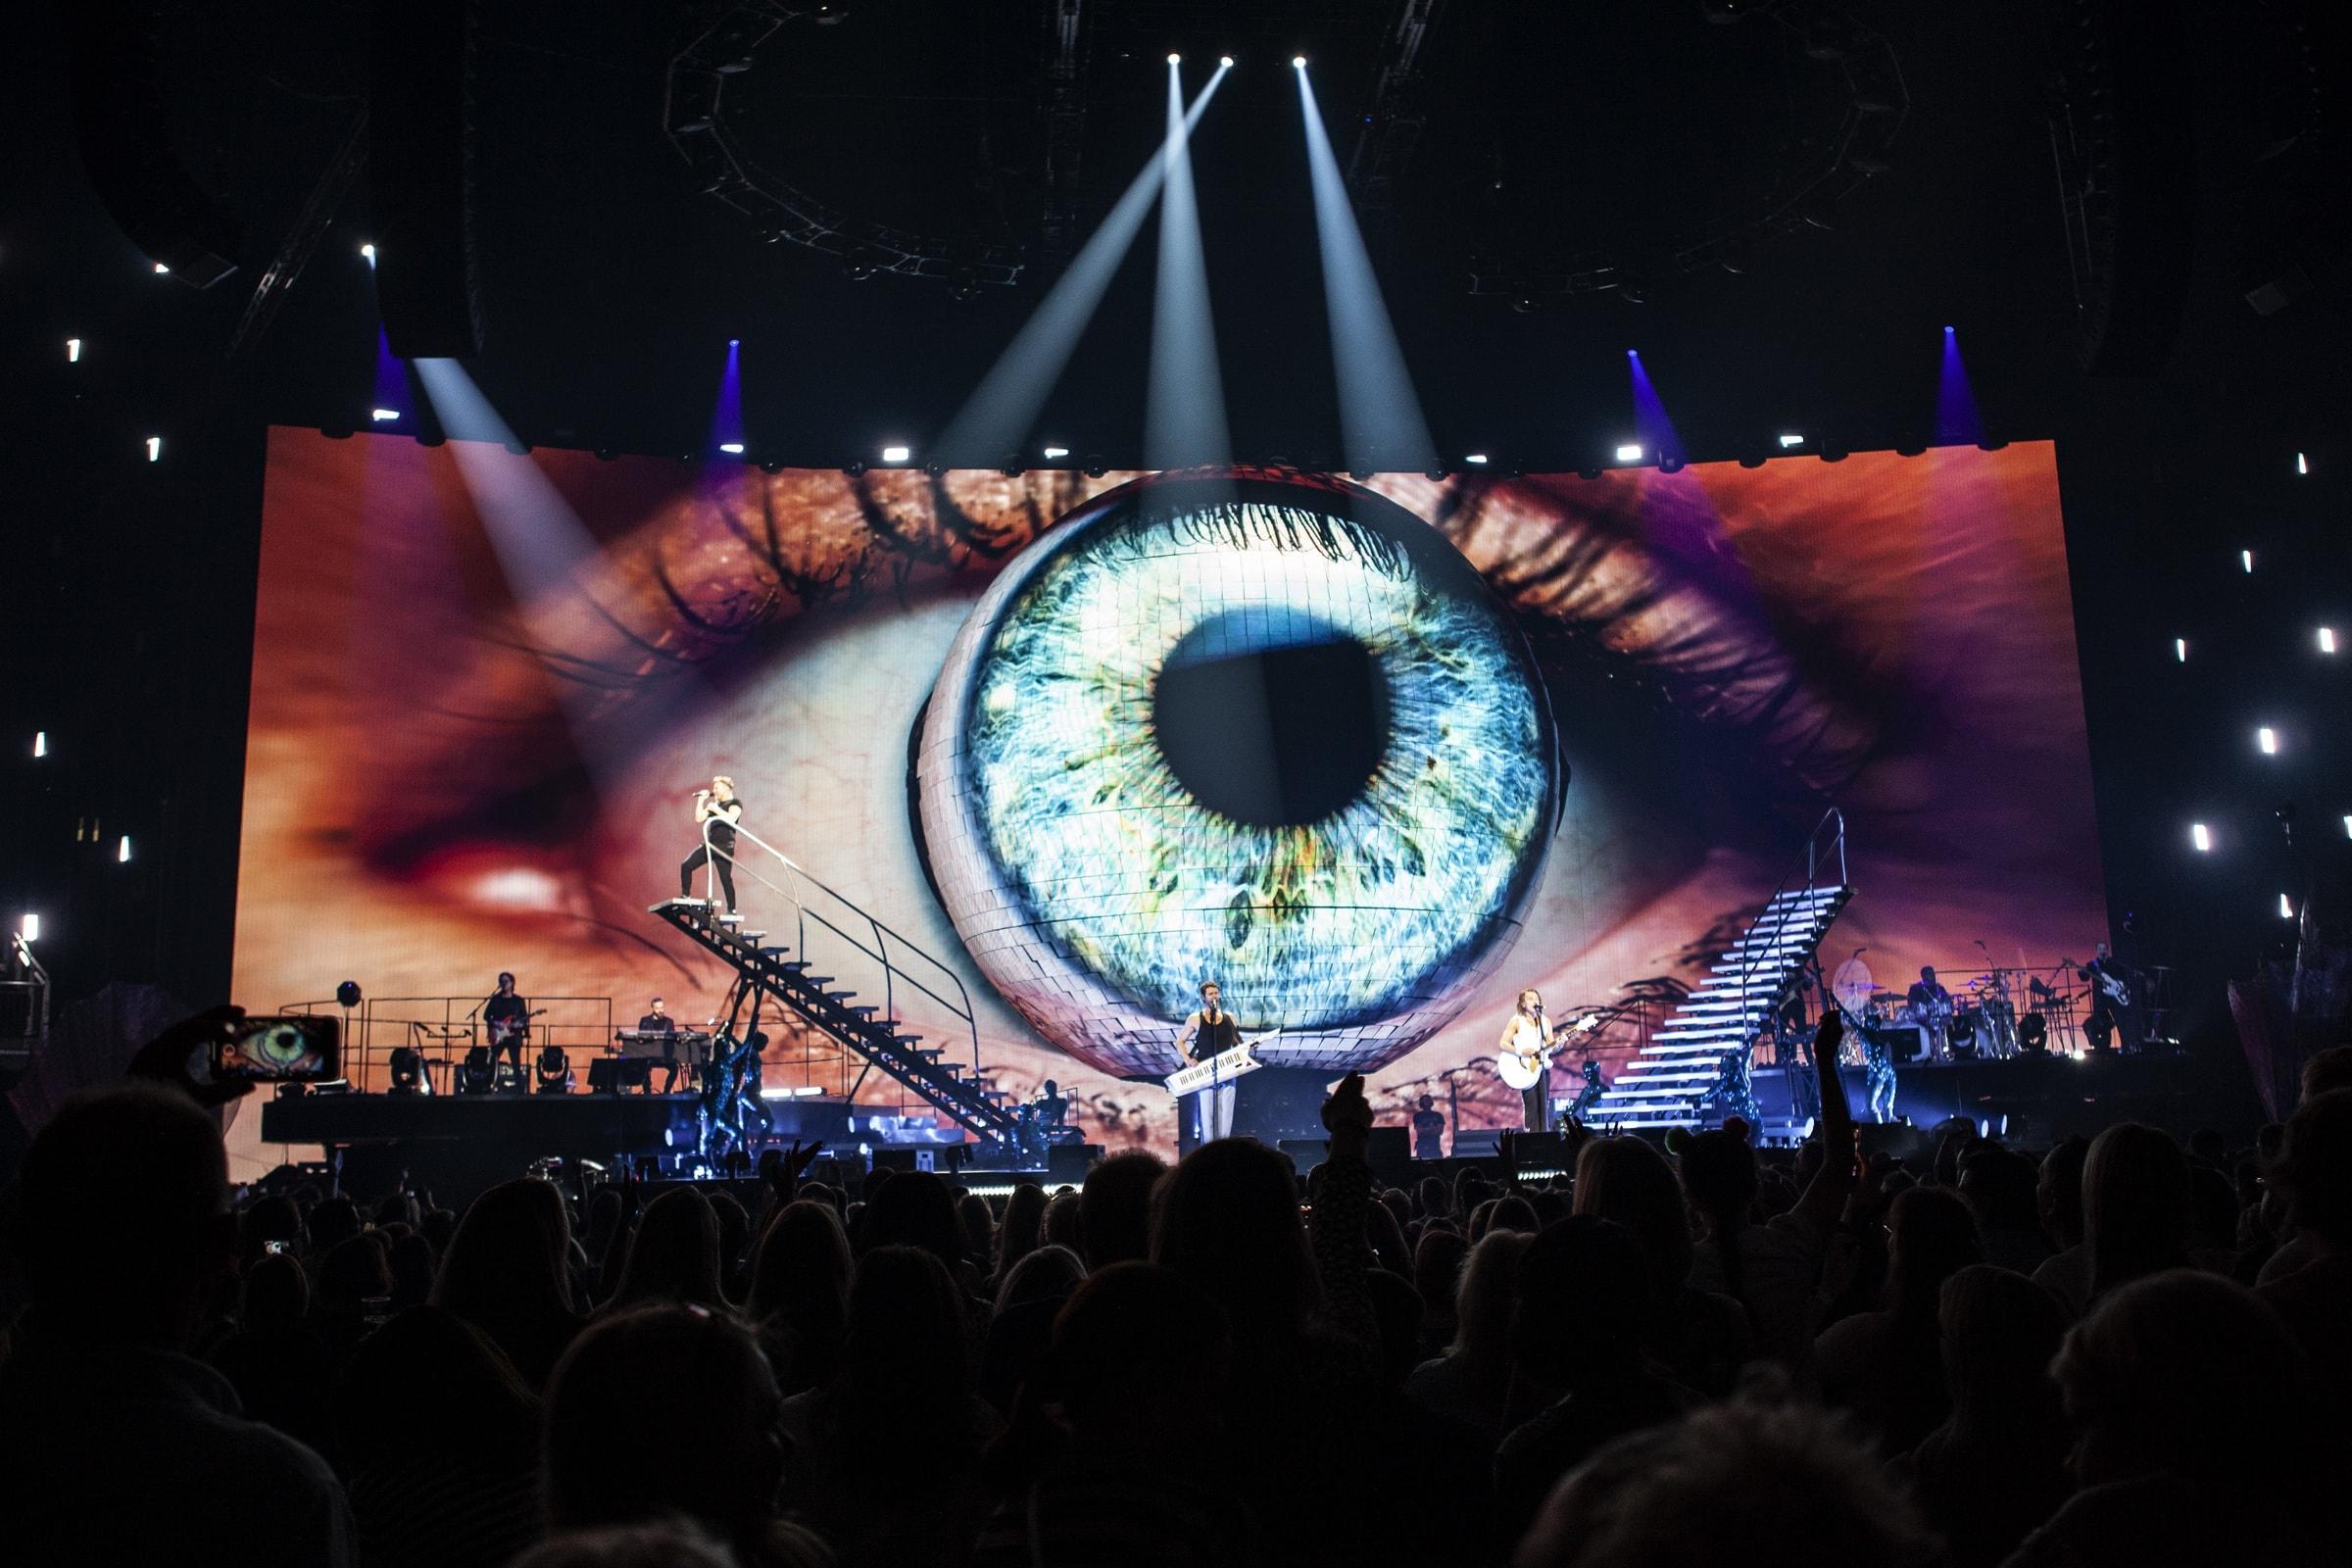 Luke Halls Studio — Take That Odyssey Tour